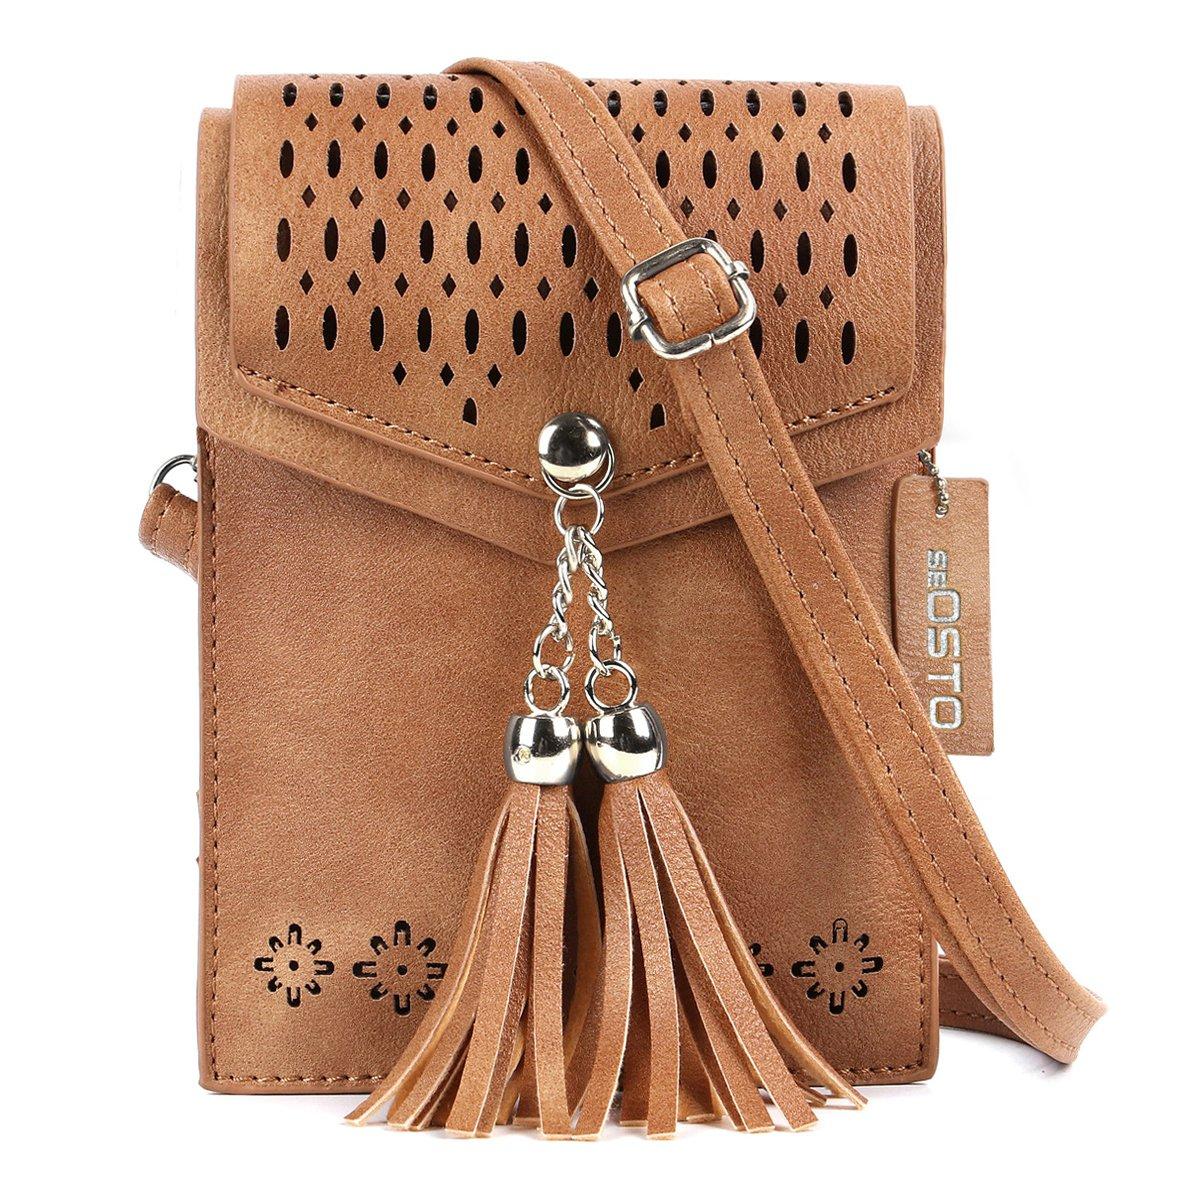 Women Small Crossbody Bag, seOSTO Tassel Cell Phone Purse Wallet Bags (Brown) …